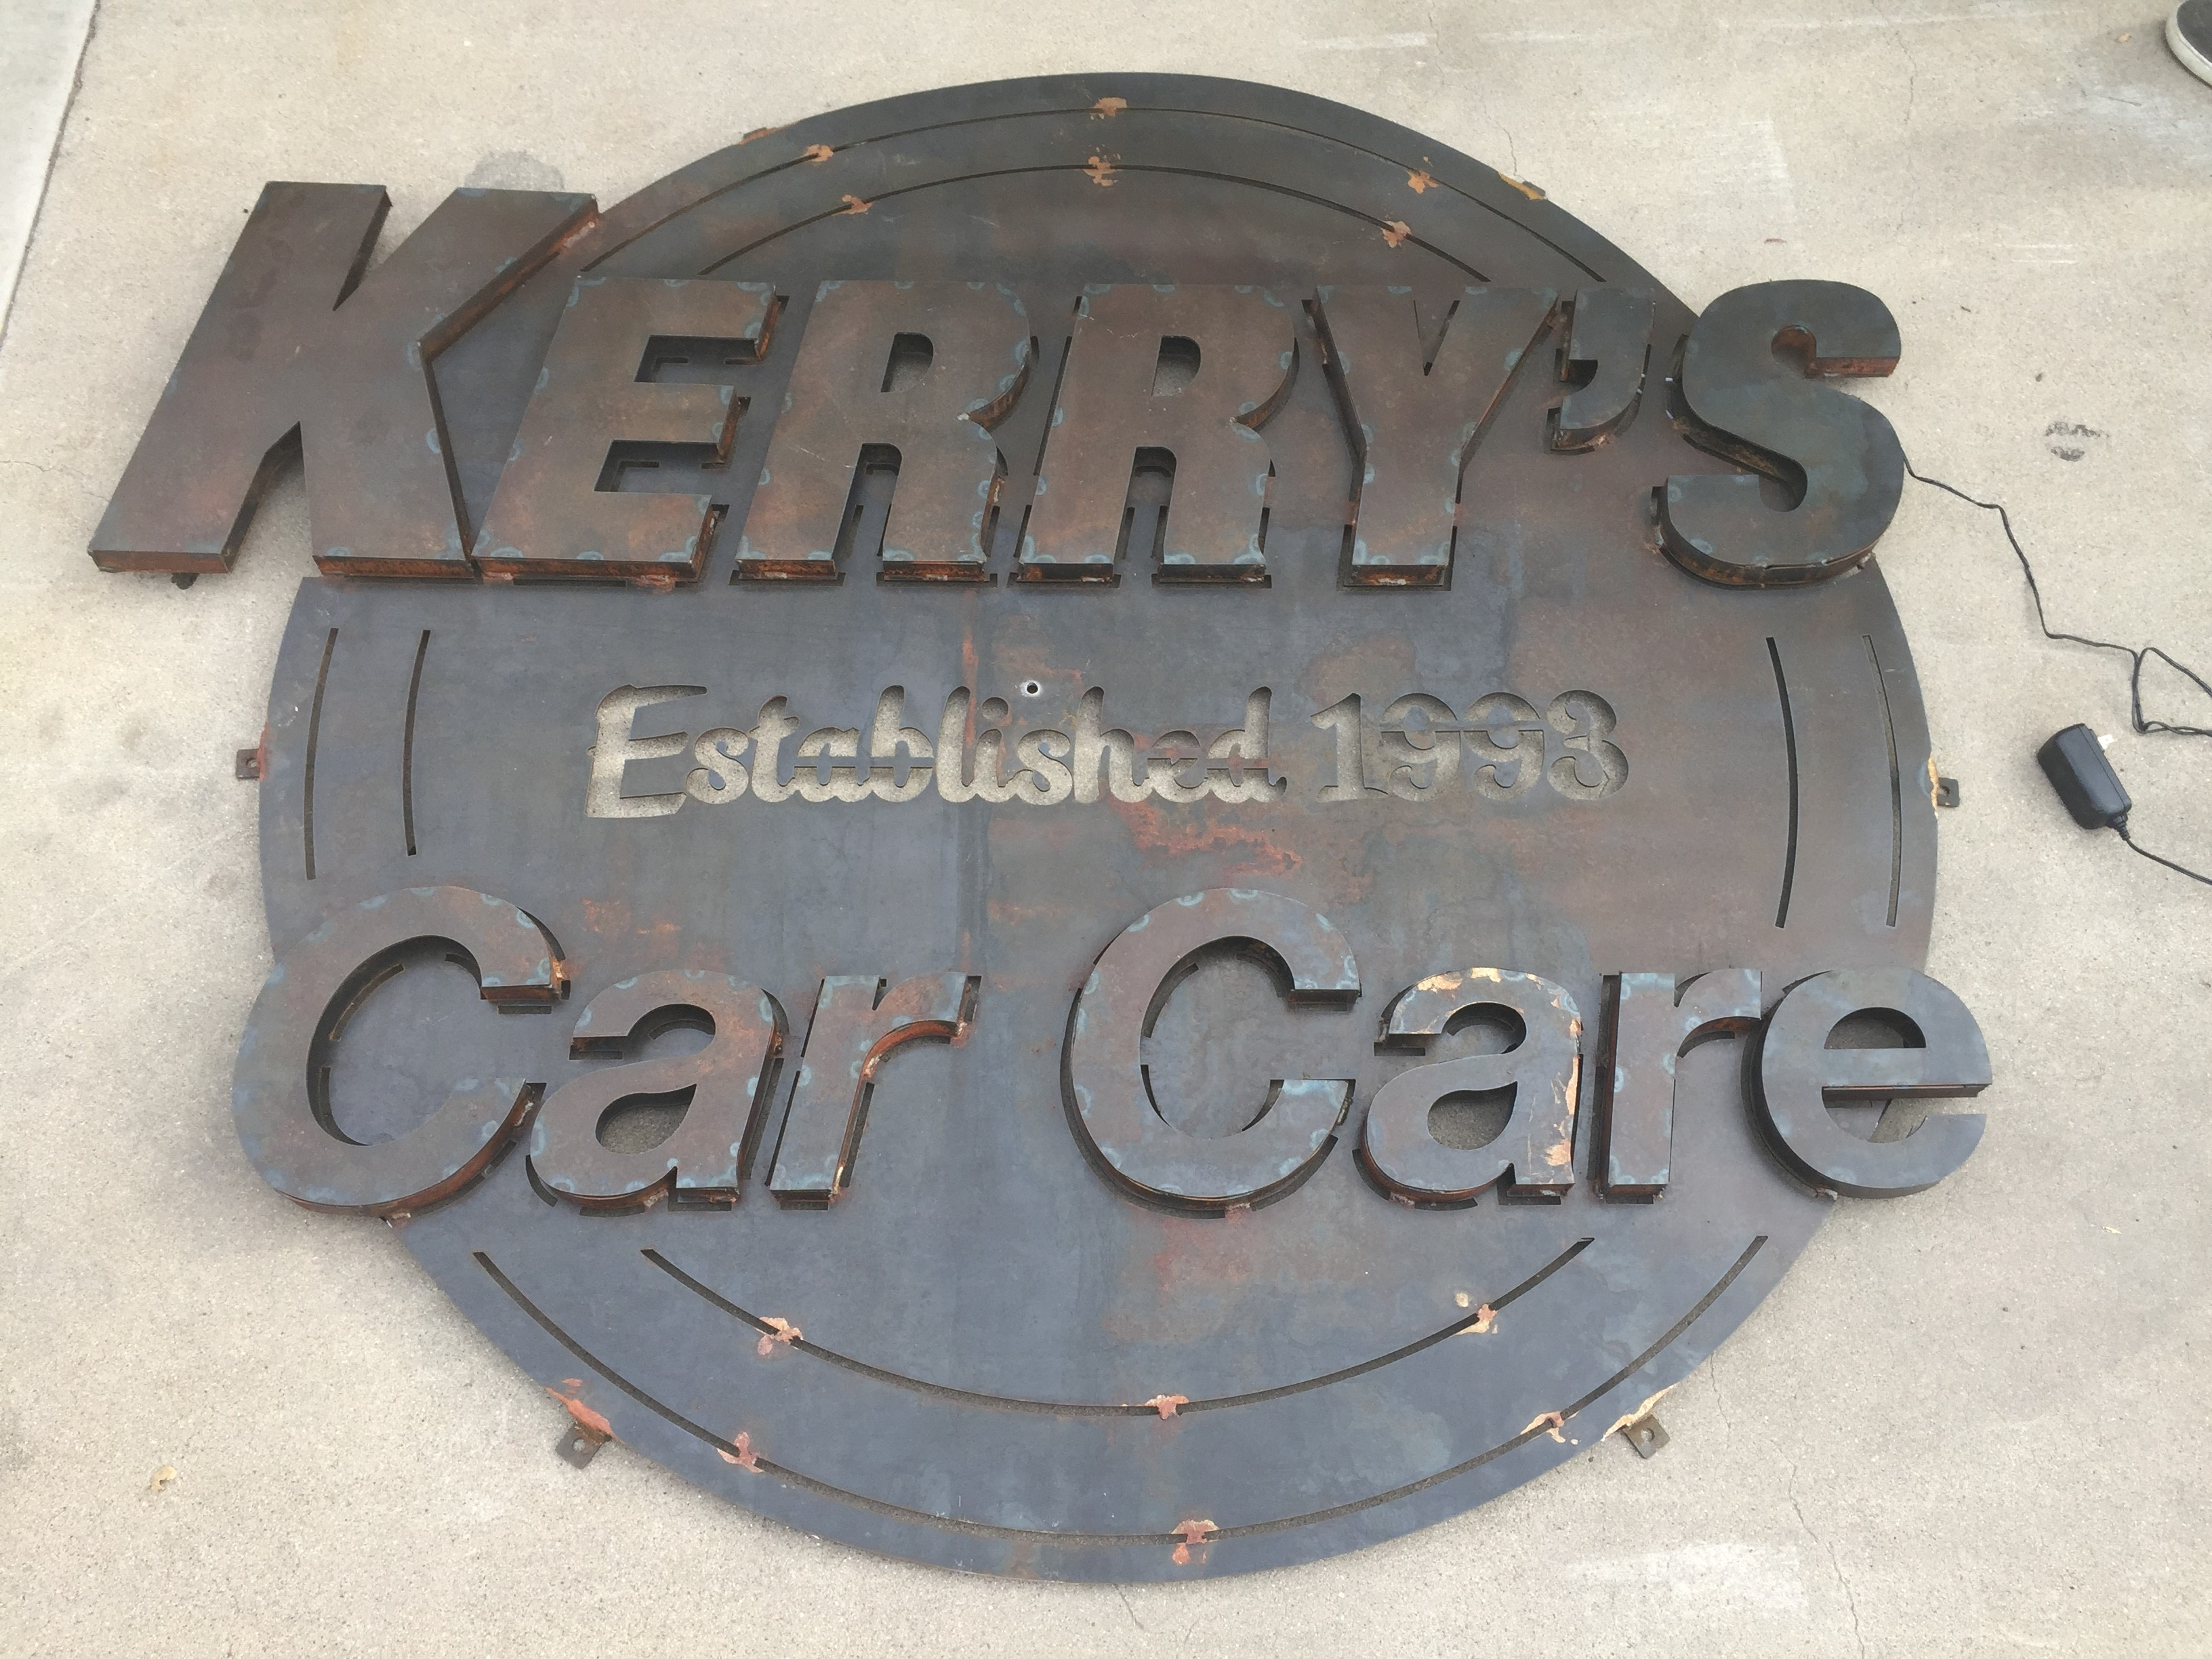 Kerry's Car Care - Mariposa image 0